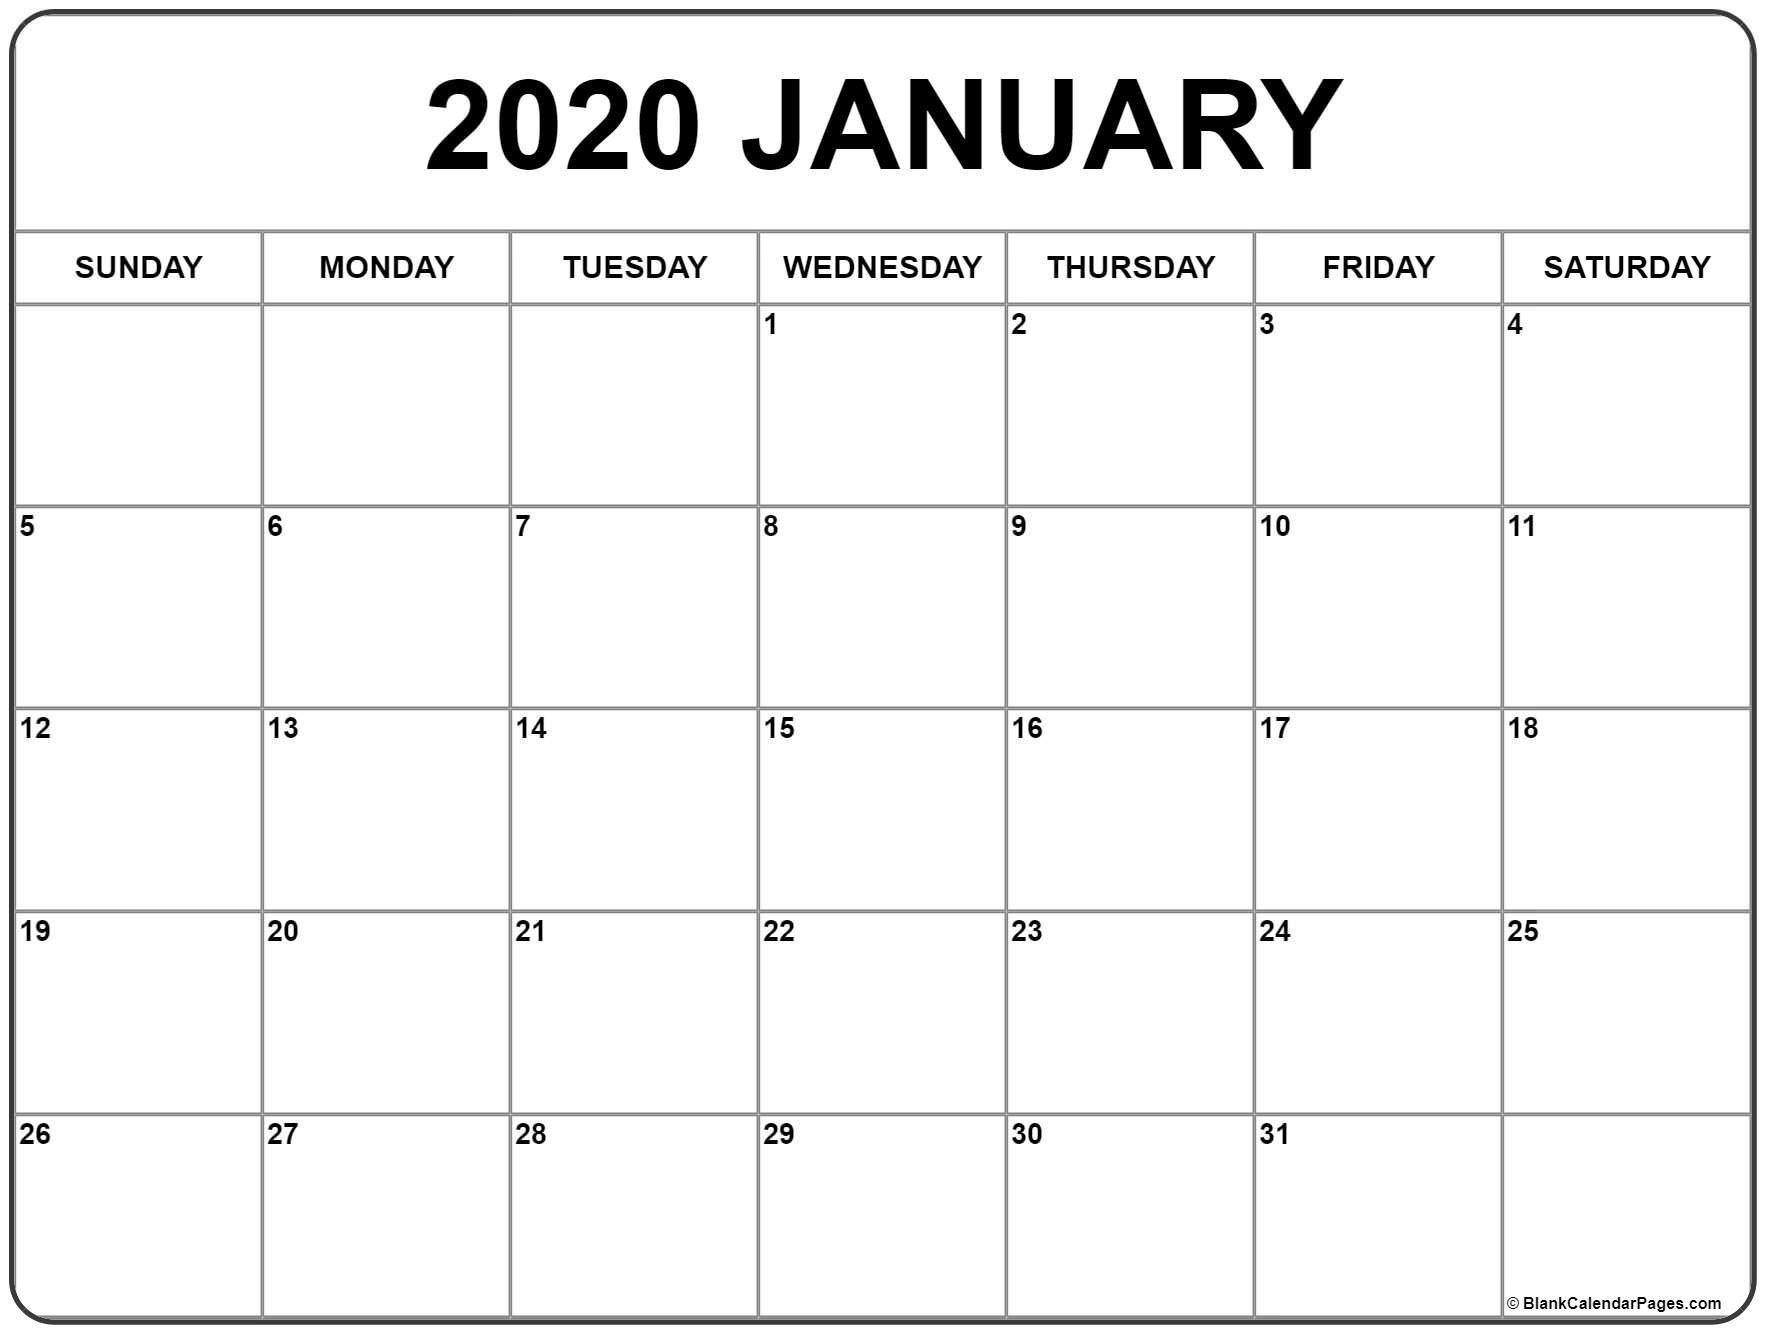 January 2020 Calendar | Free Printable Monthly Calendars-Cute January 2020 Calendar